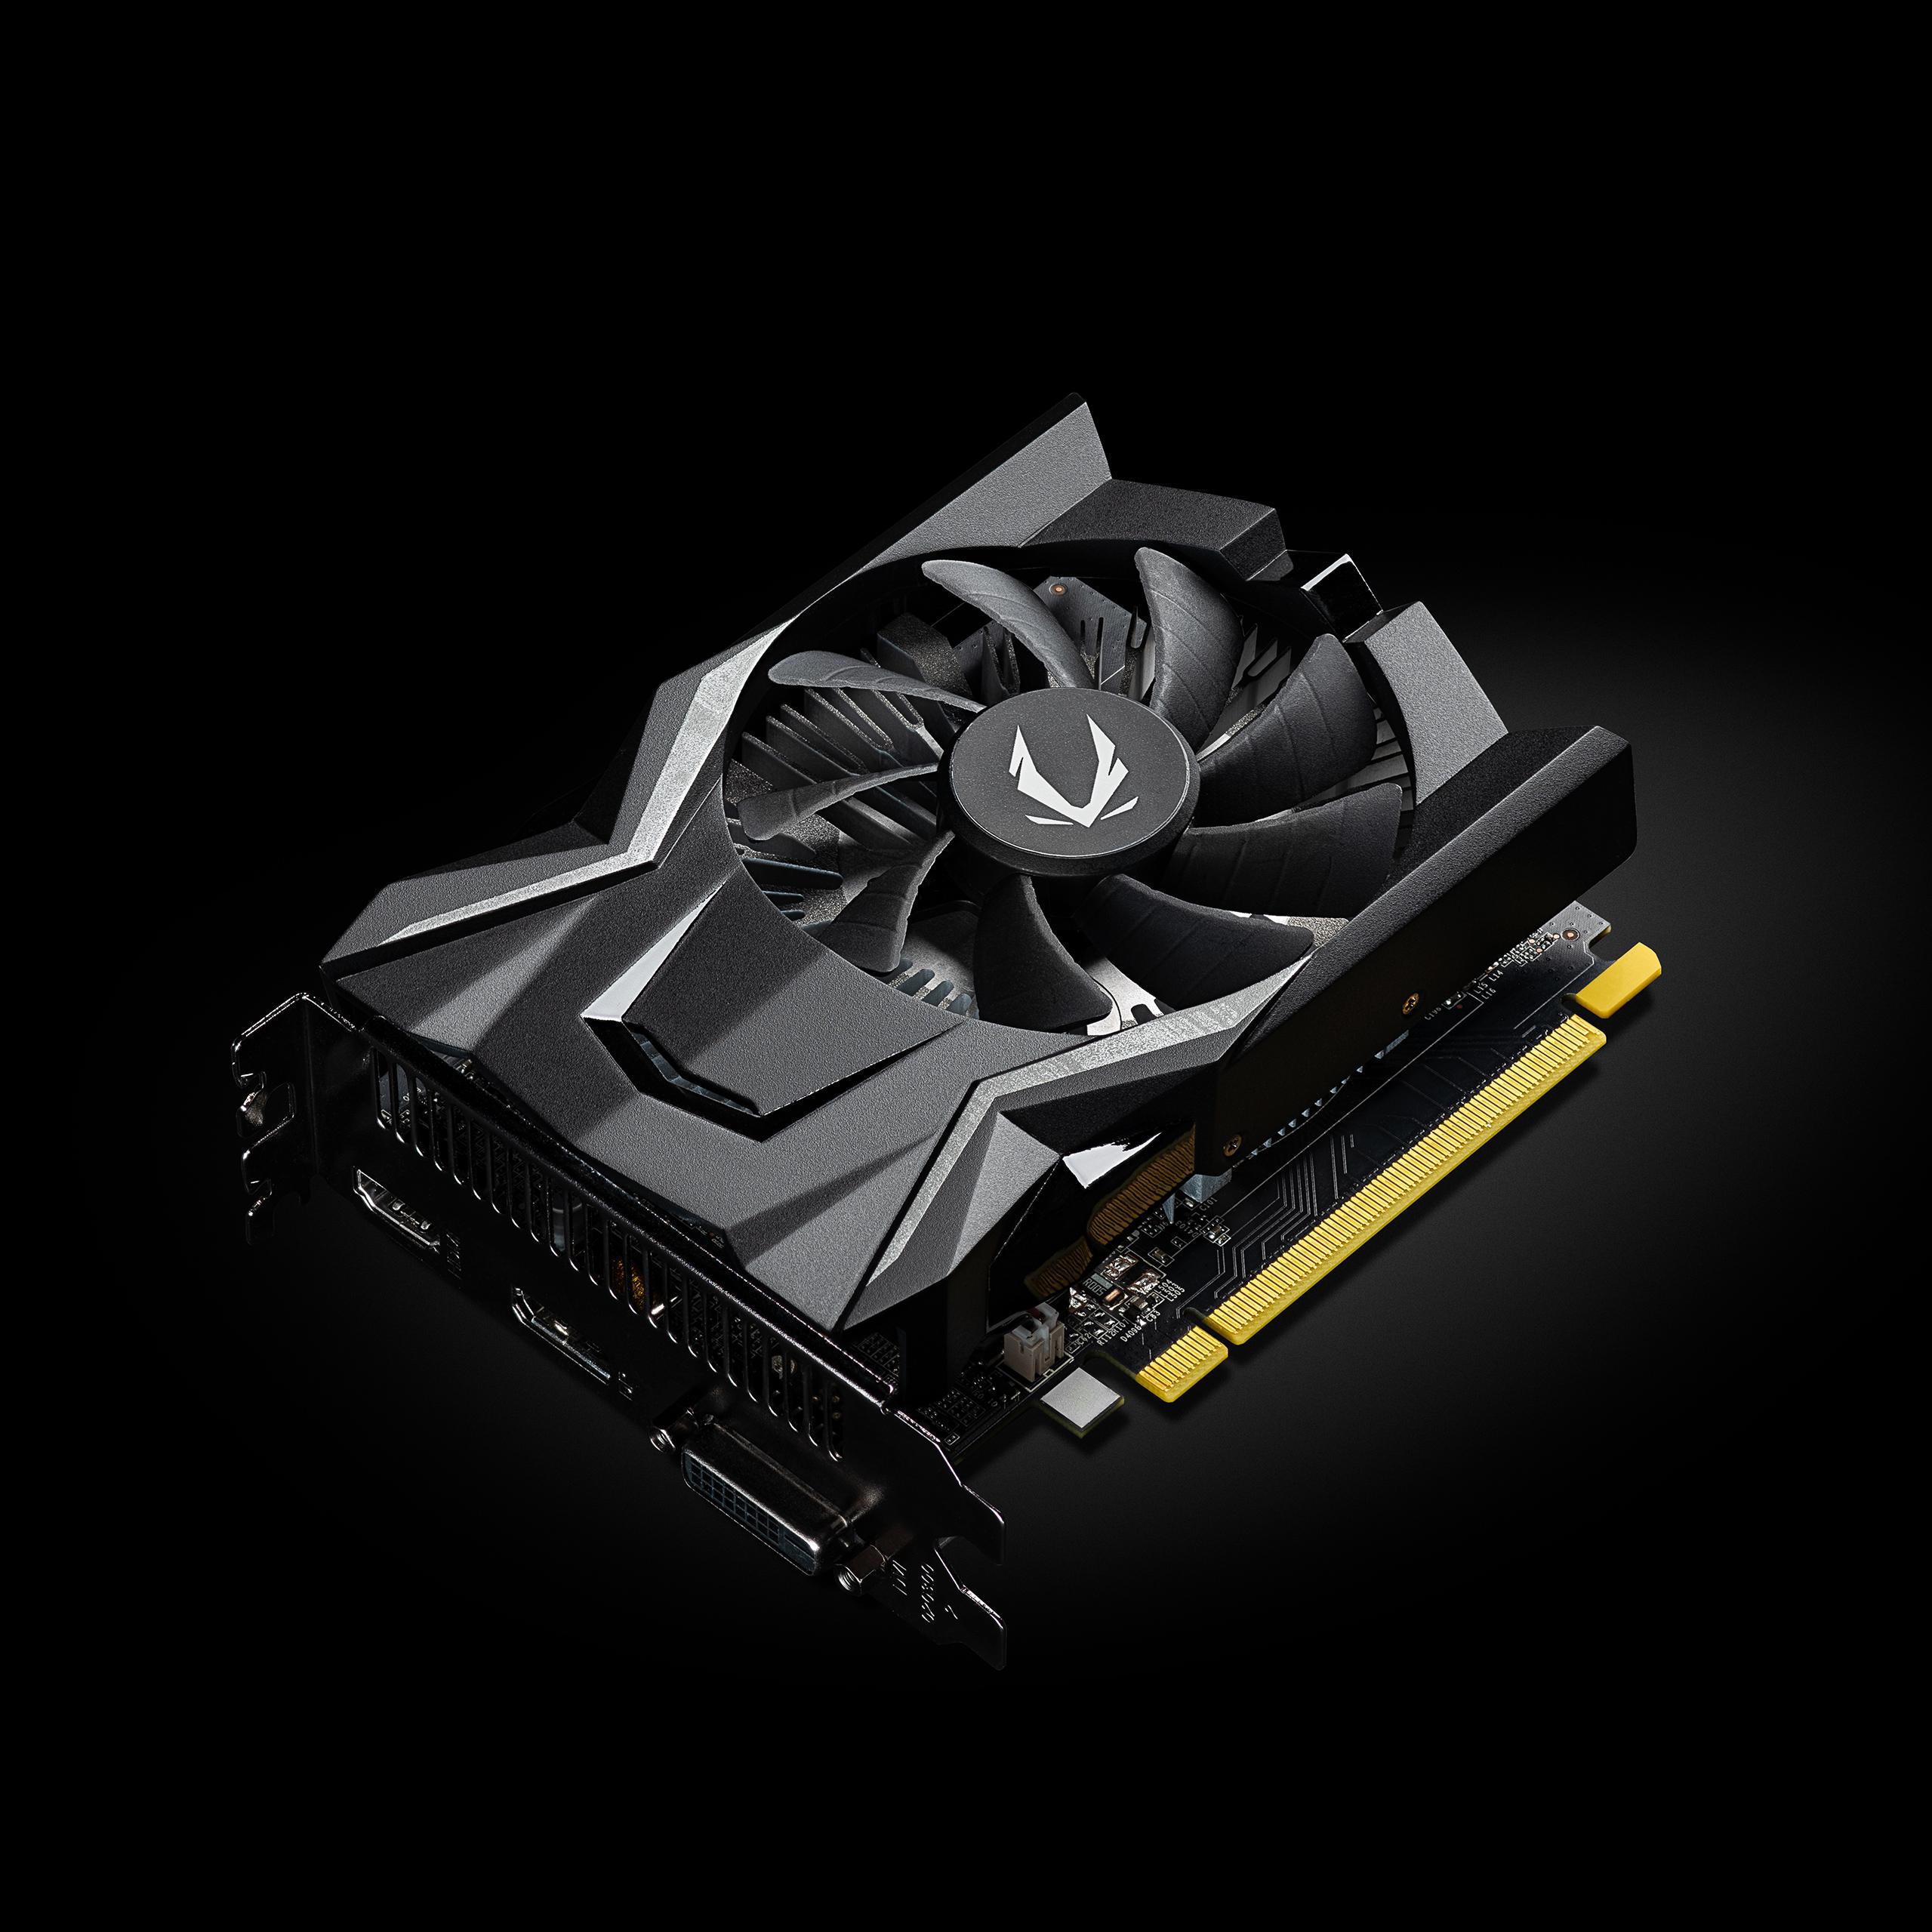 GeForce GTX 1650 Graphics Card | NVIDIA